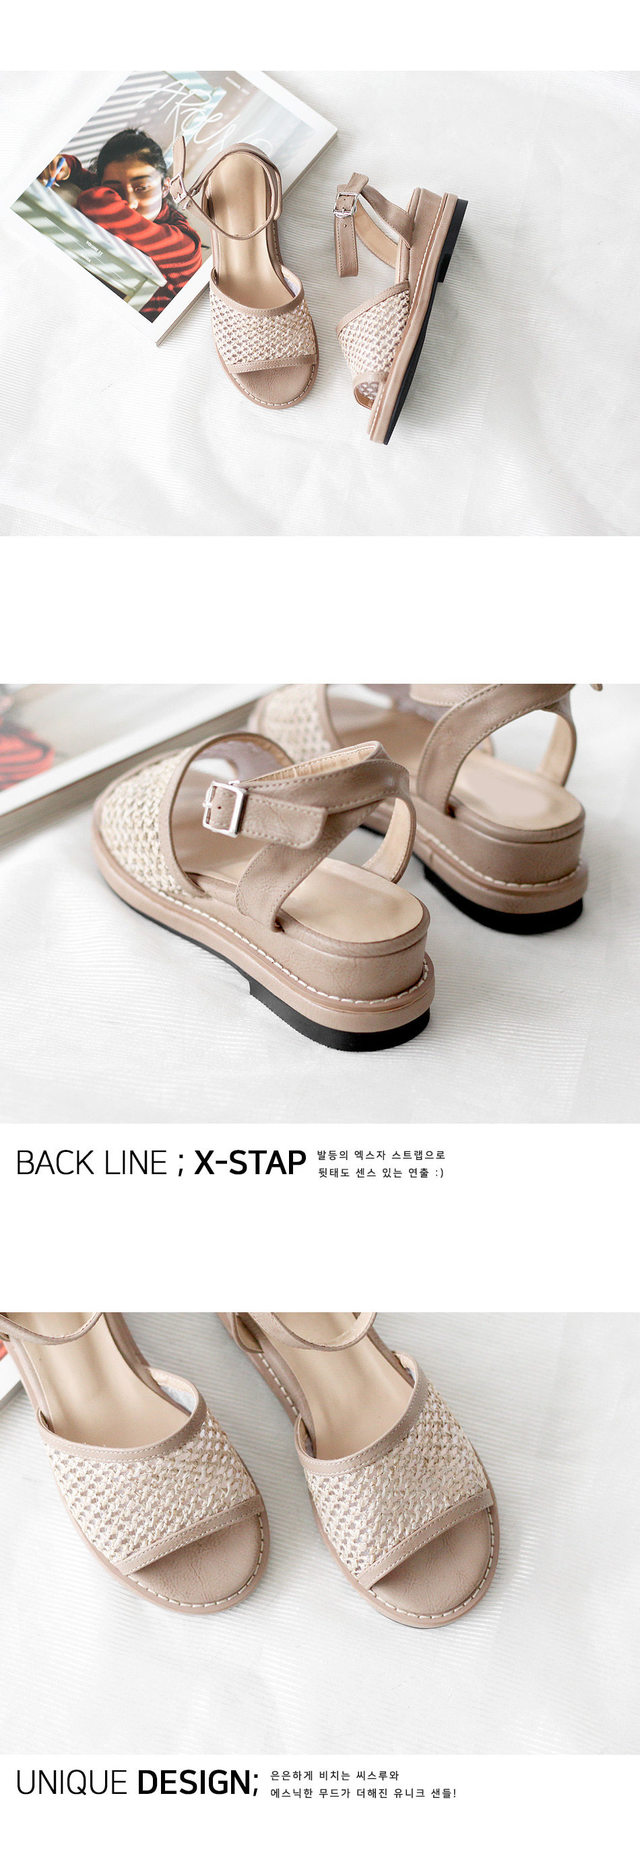 Loose wedge strap sandals 4.5cm